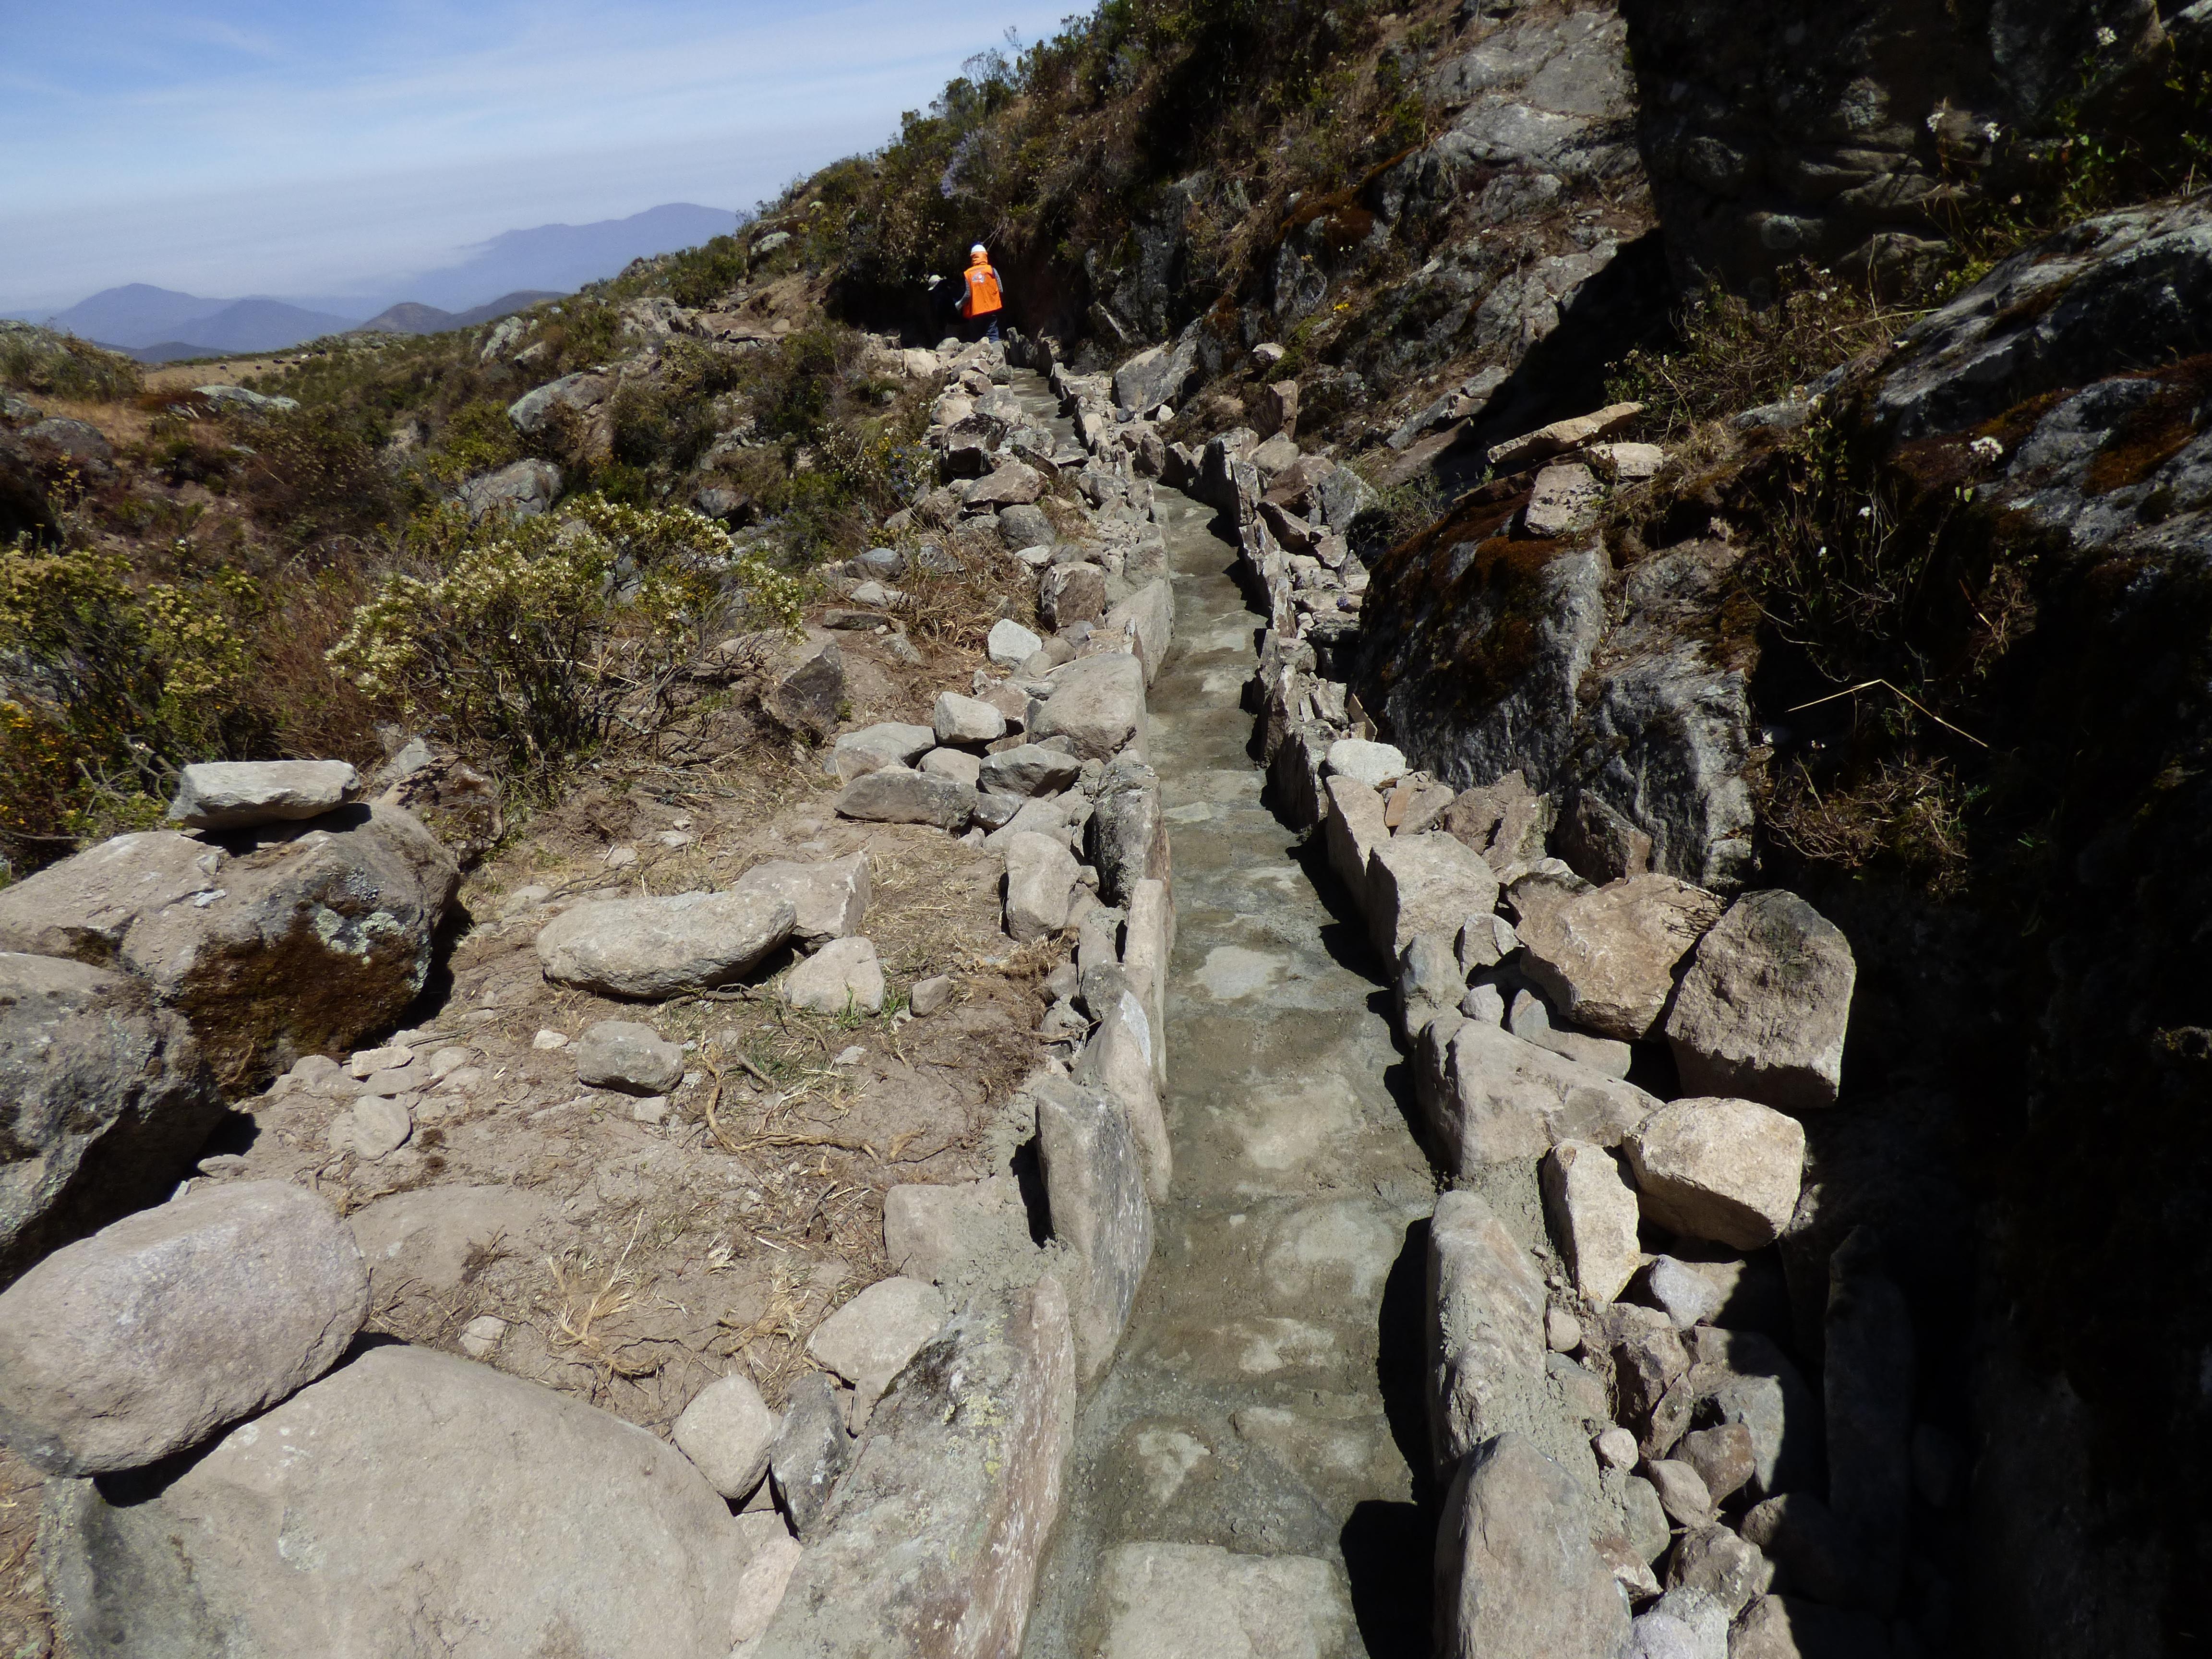 Rehabilitación de la amuna Pacchipucro en Huamantanga